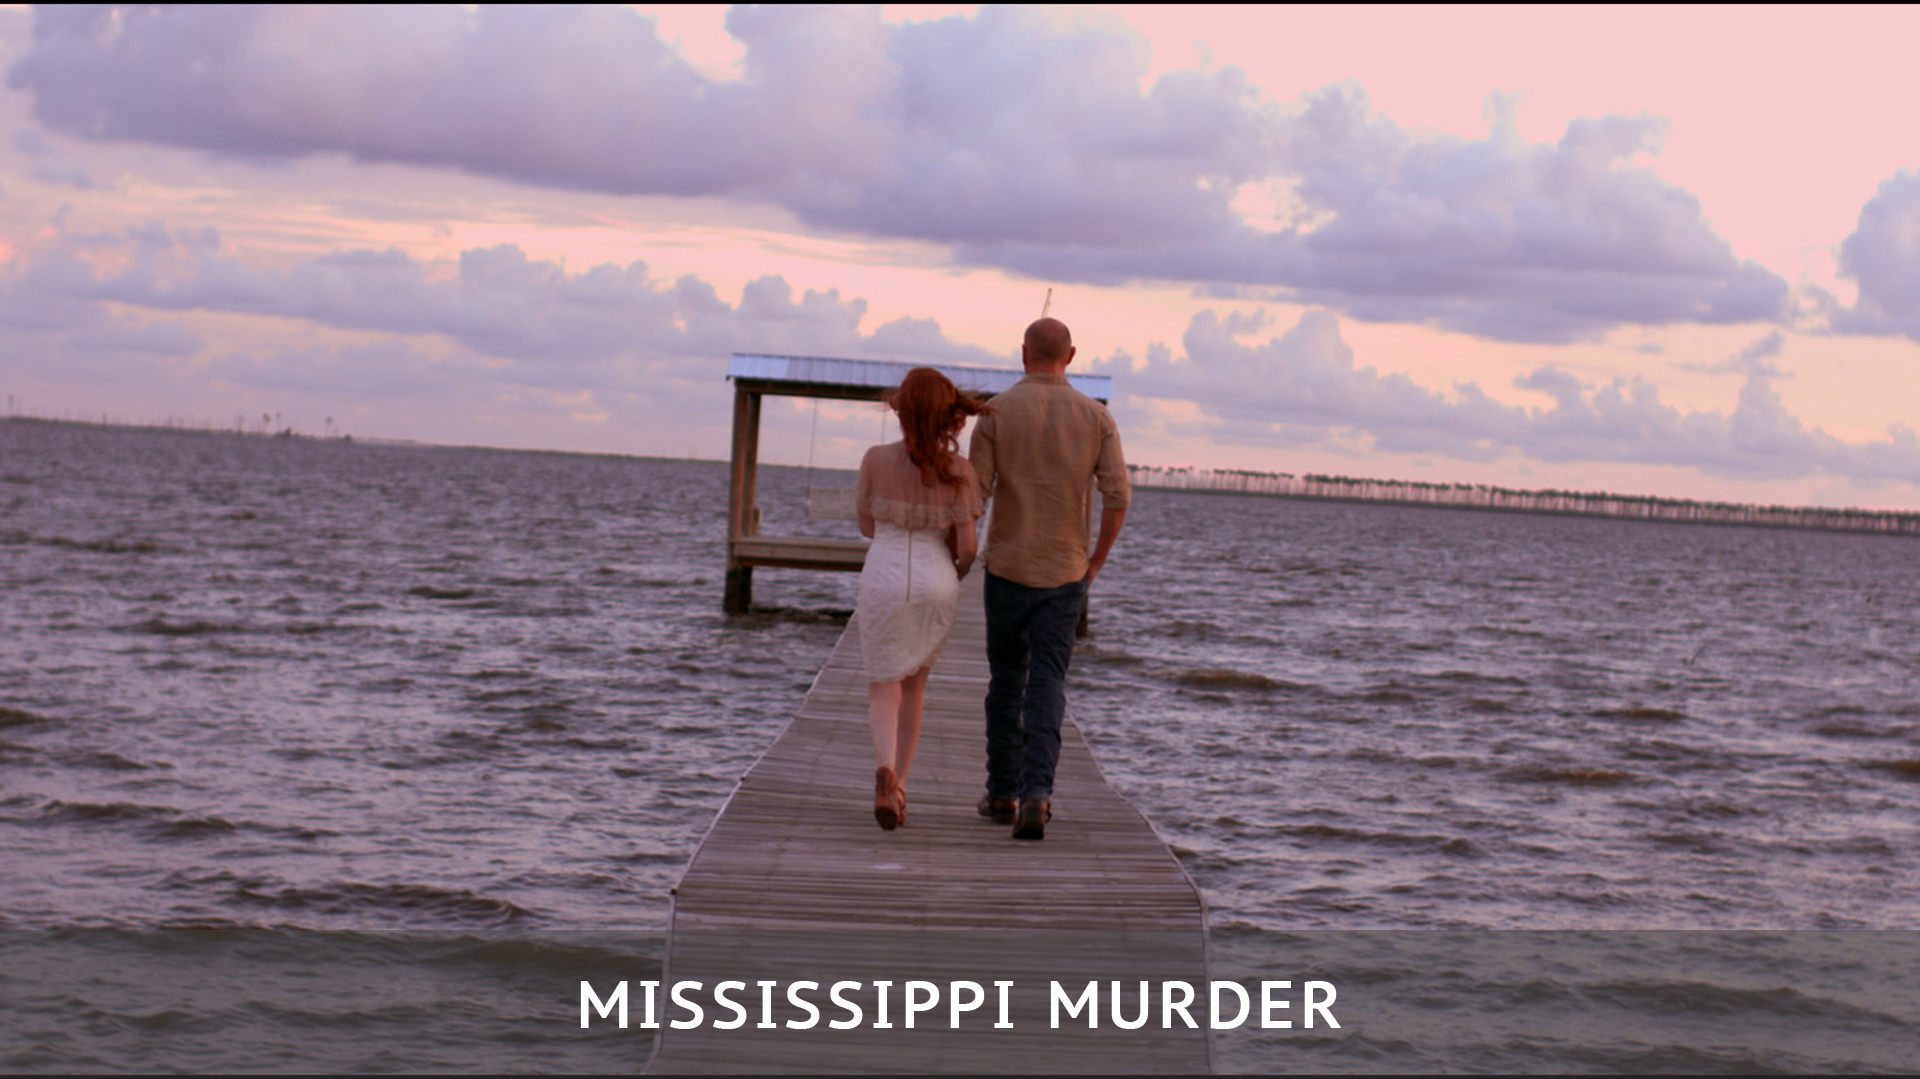 Mississippi Murder - Color Grading / Color Correction / Post Production